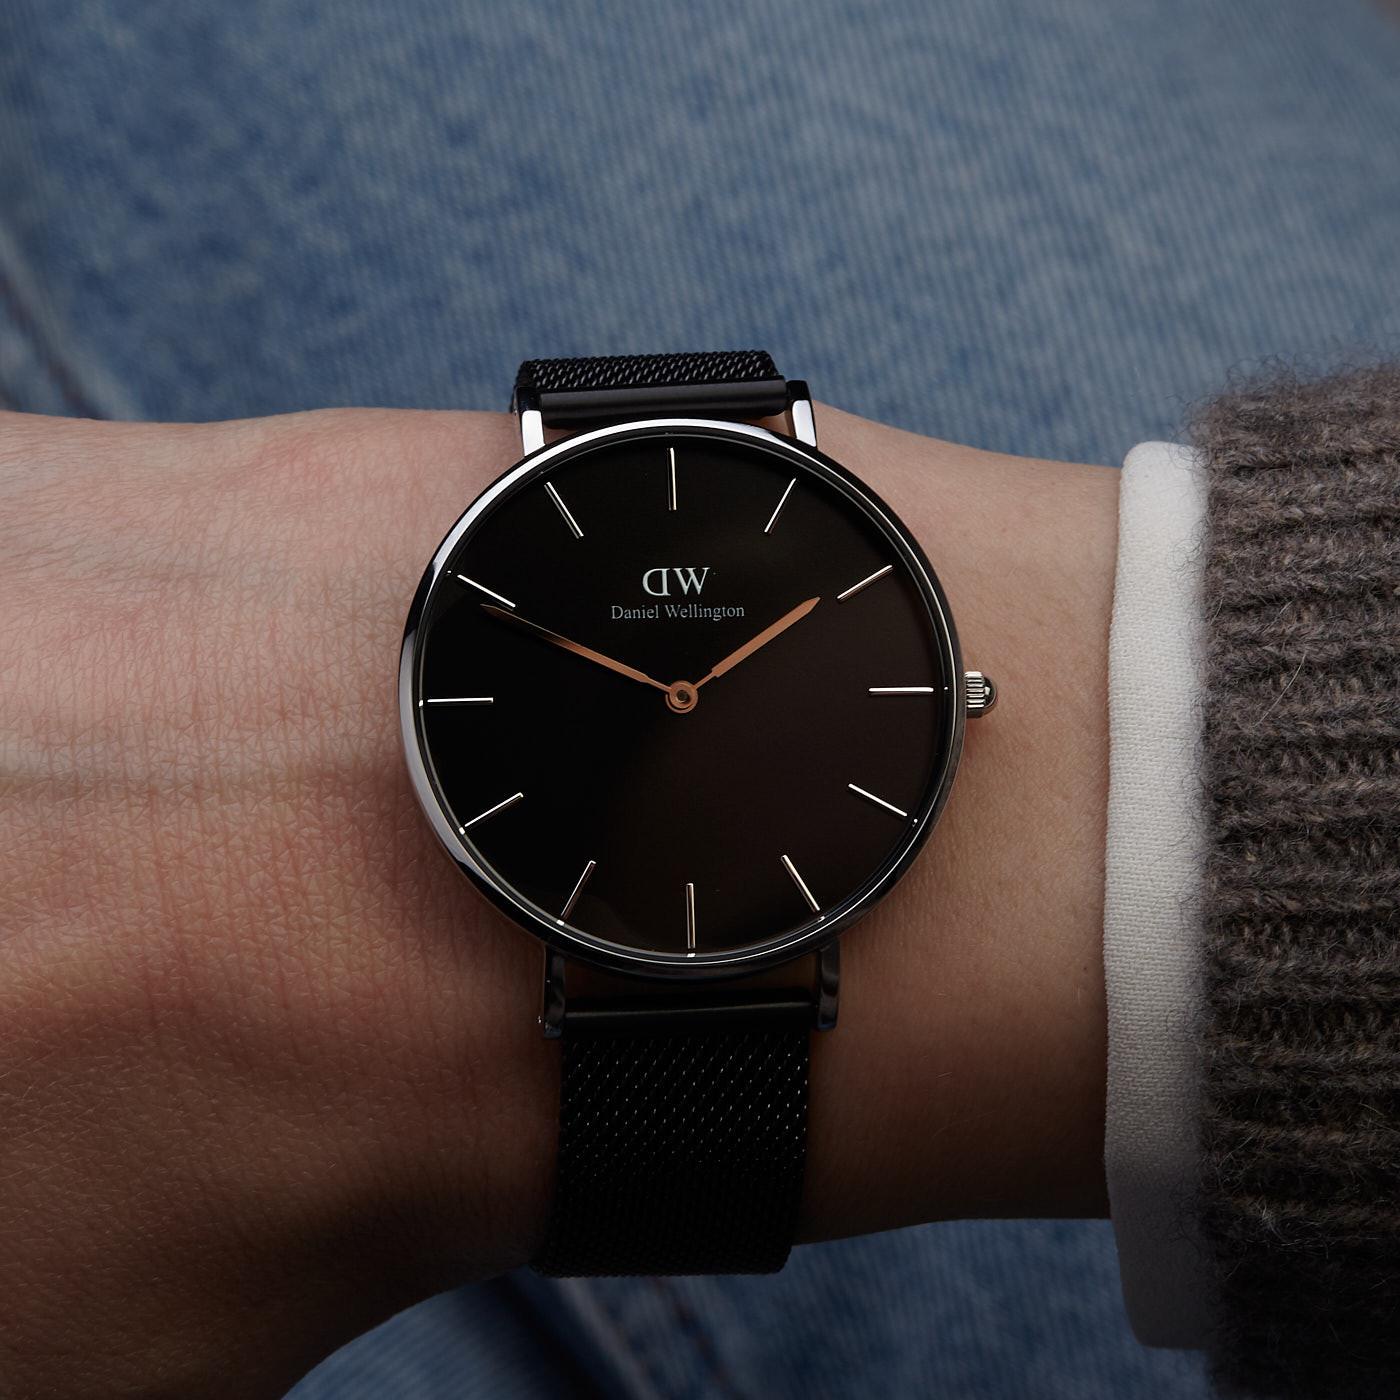 Daniel Wellington Petite watch DW00100308 - Watches